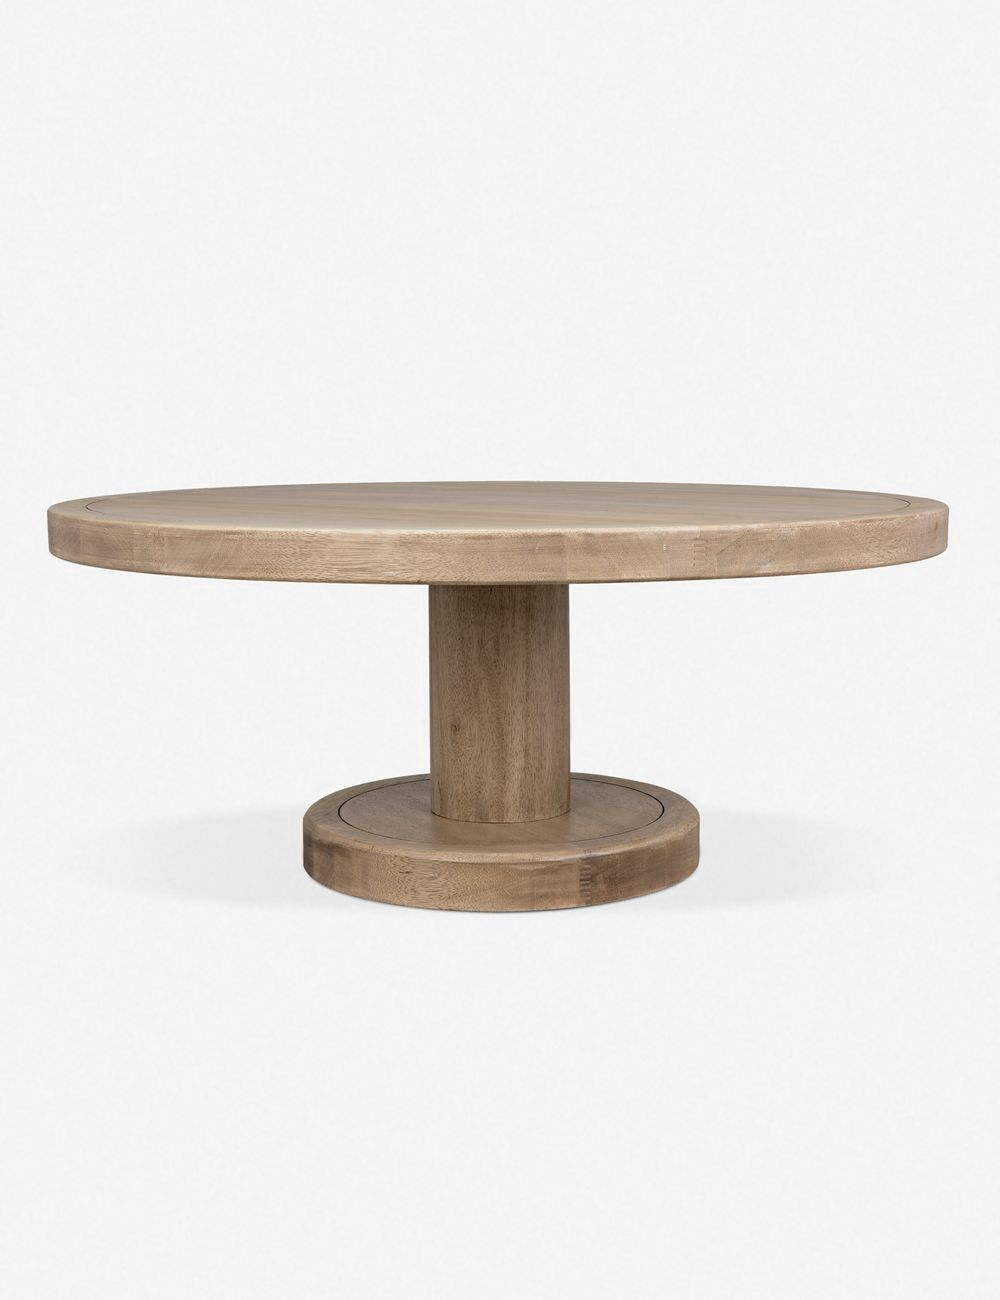 Kirsi Round Coffee Table Handmade Dining Room Tables Coffee Table Wood Round Coffee Table [ 1300 x 1000 Pixel ]